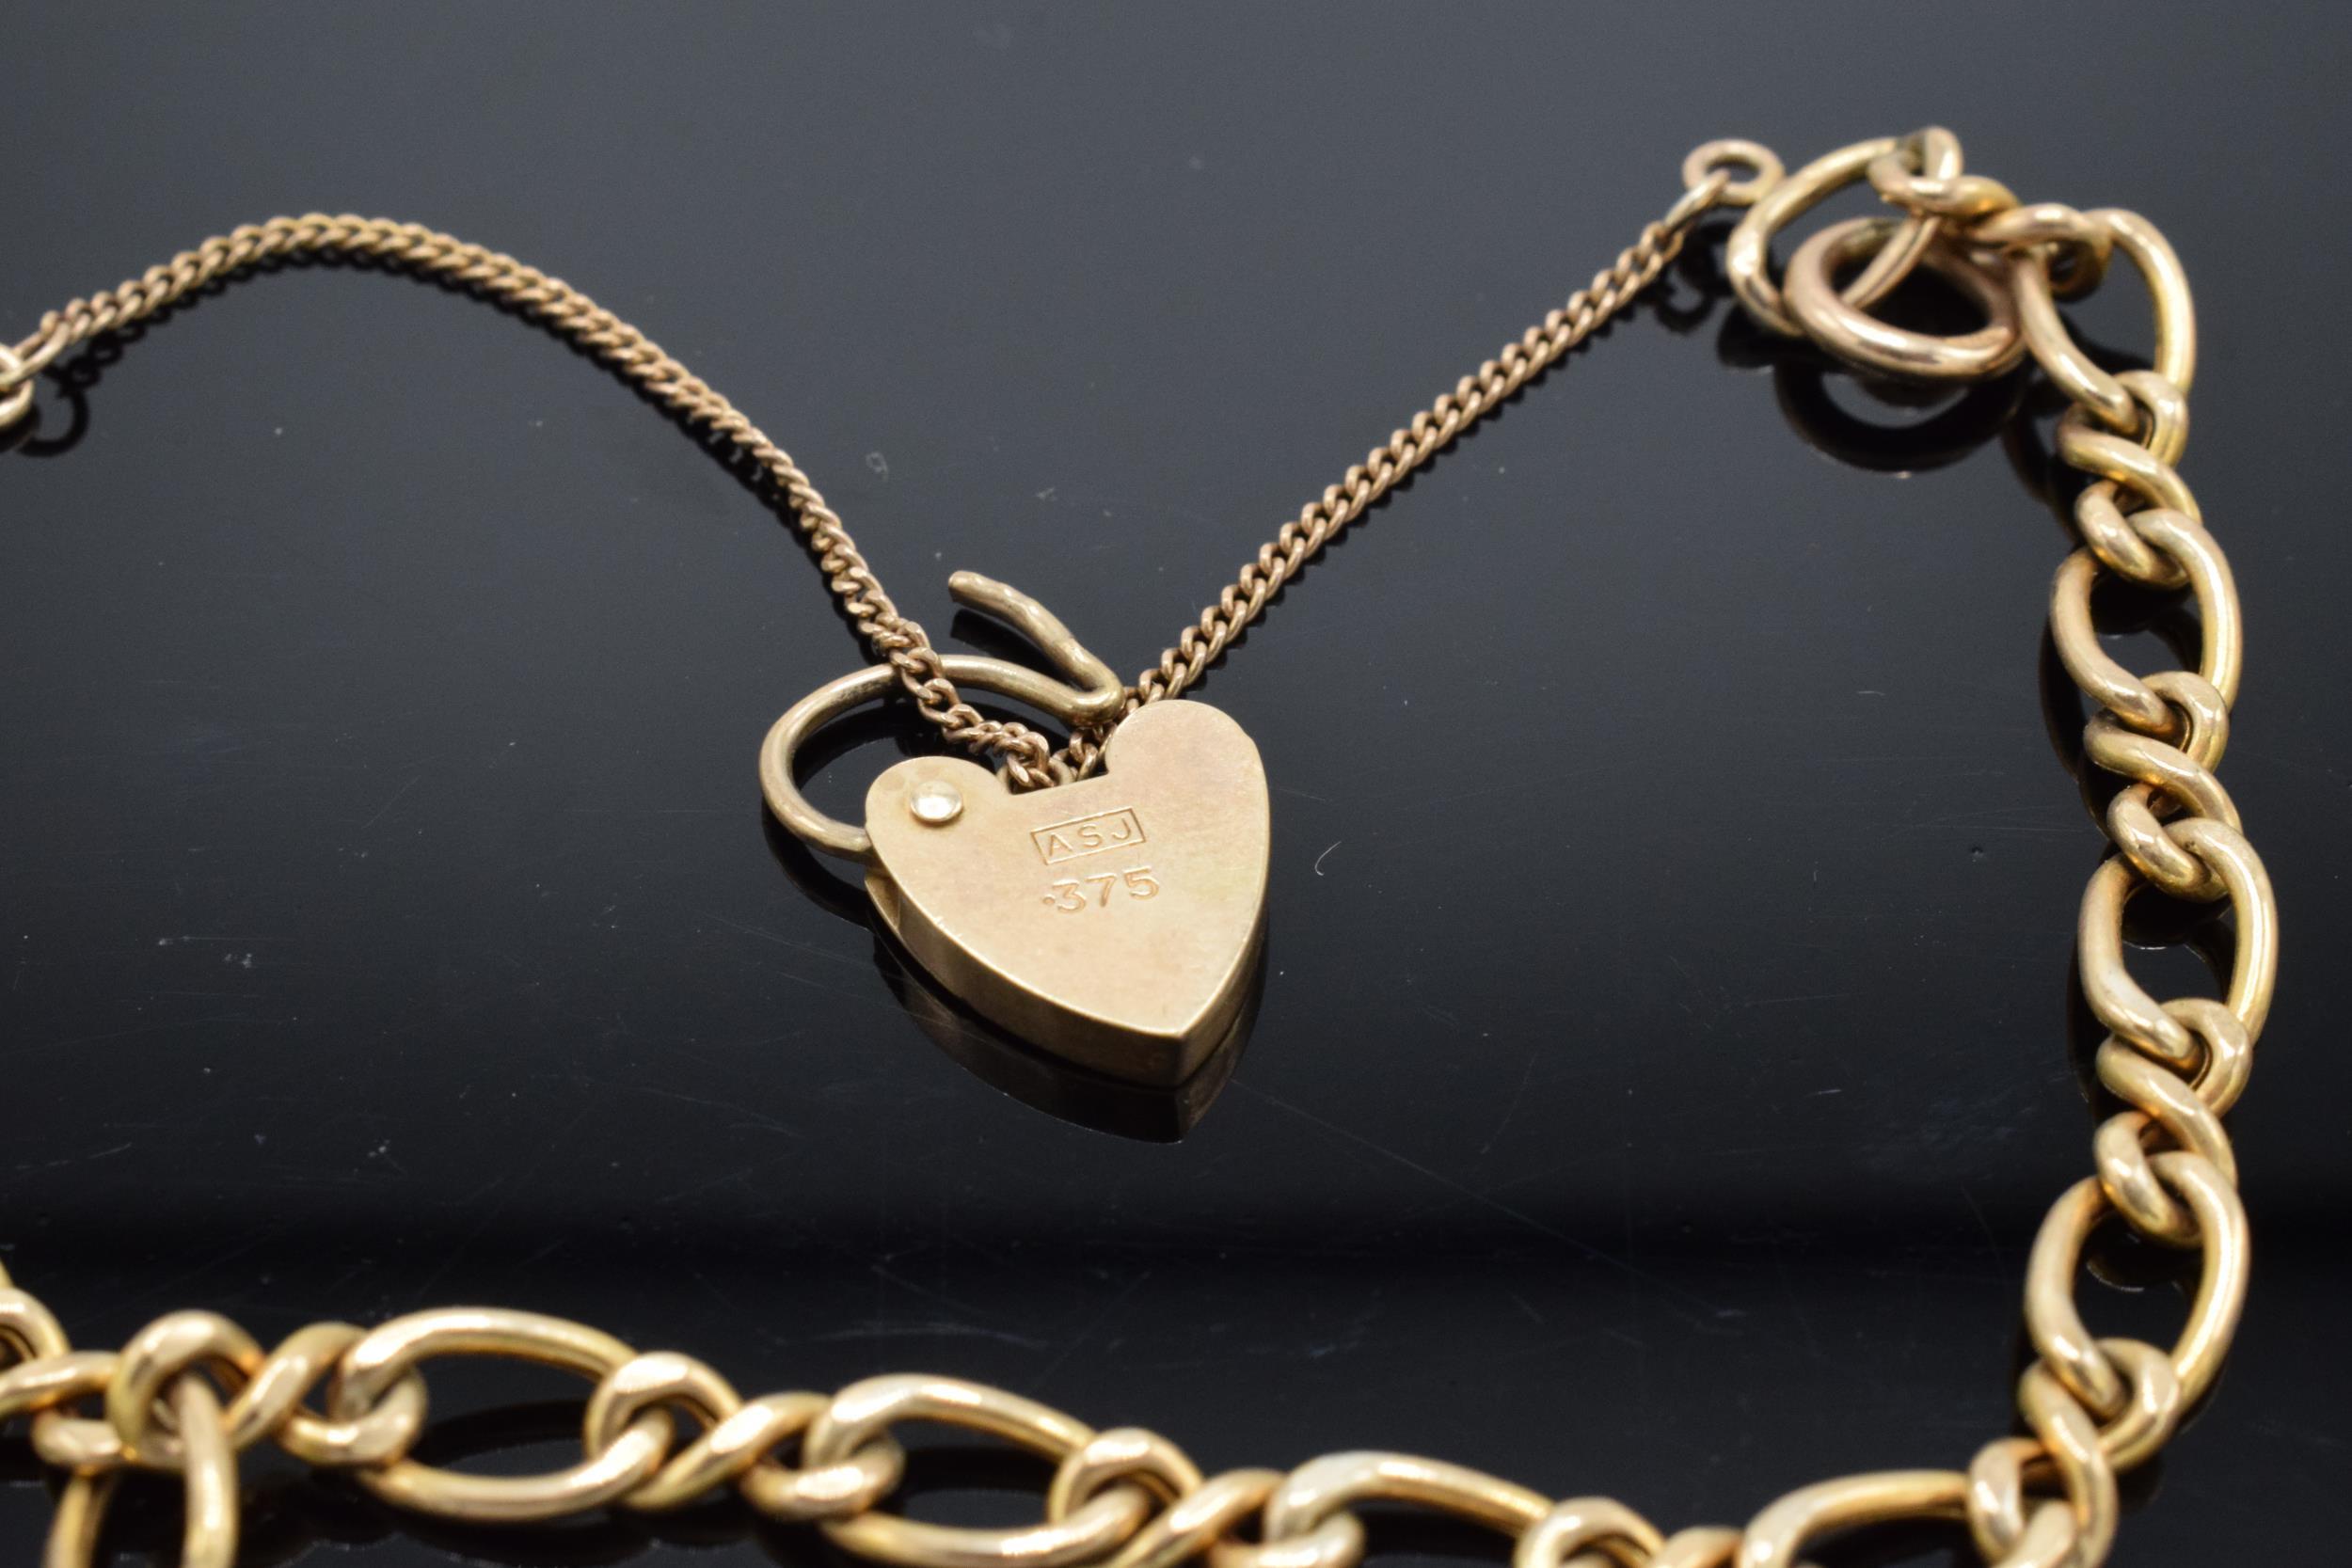 9ct gold charm bracelet 5.2g - Image 3 of 3